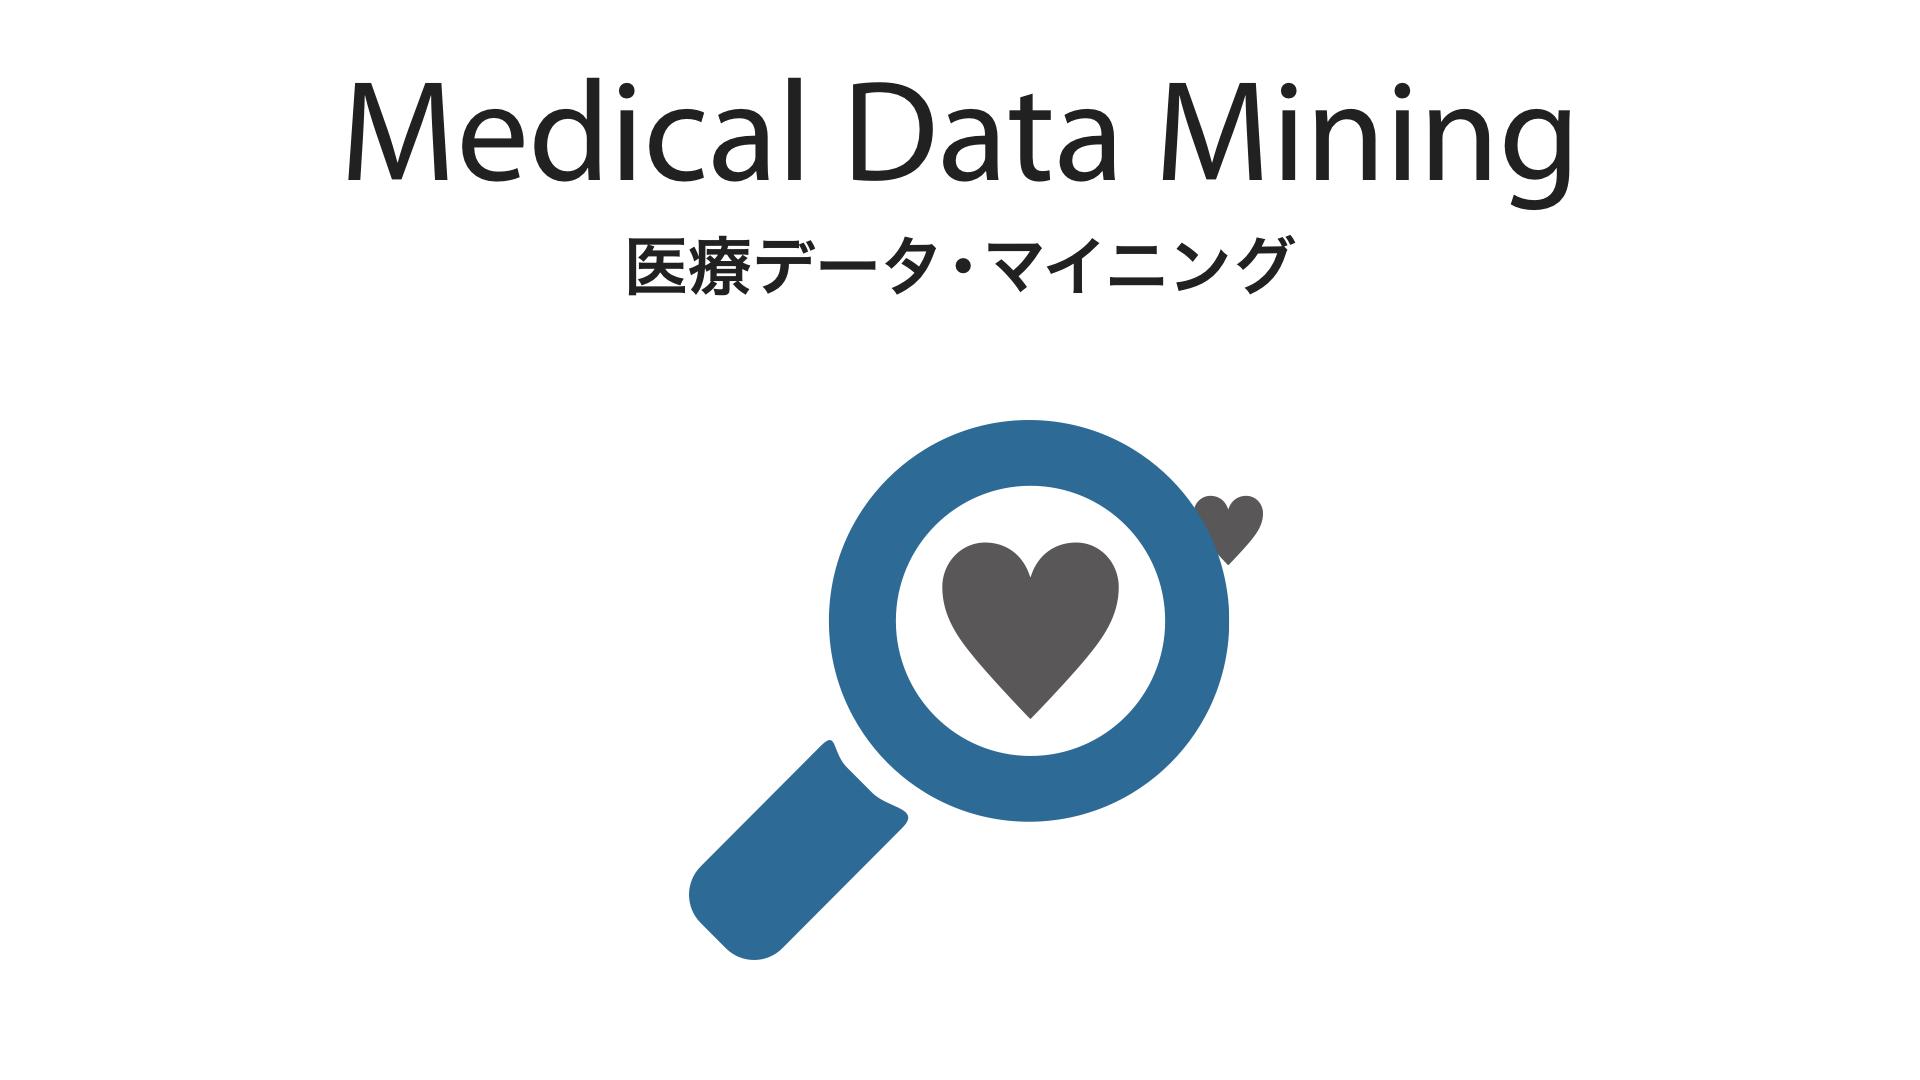 medical_data_mining.png